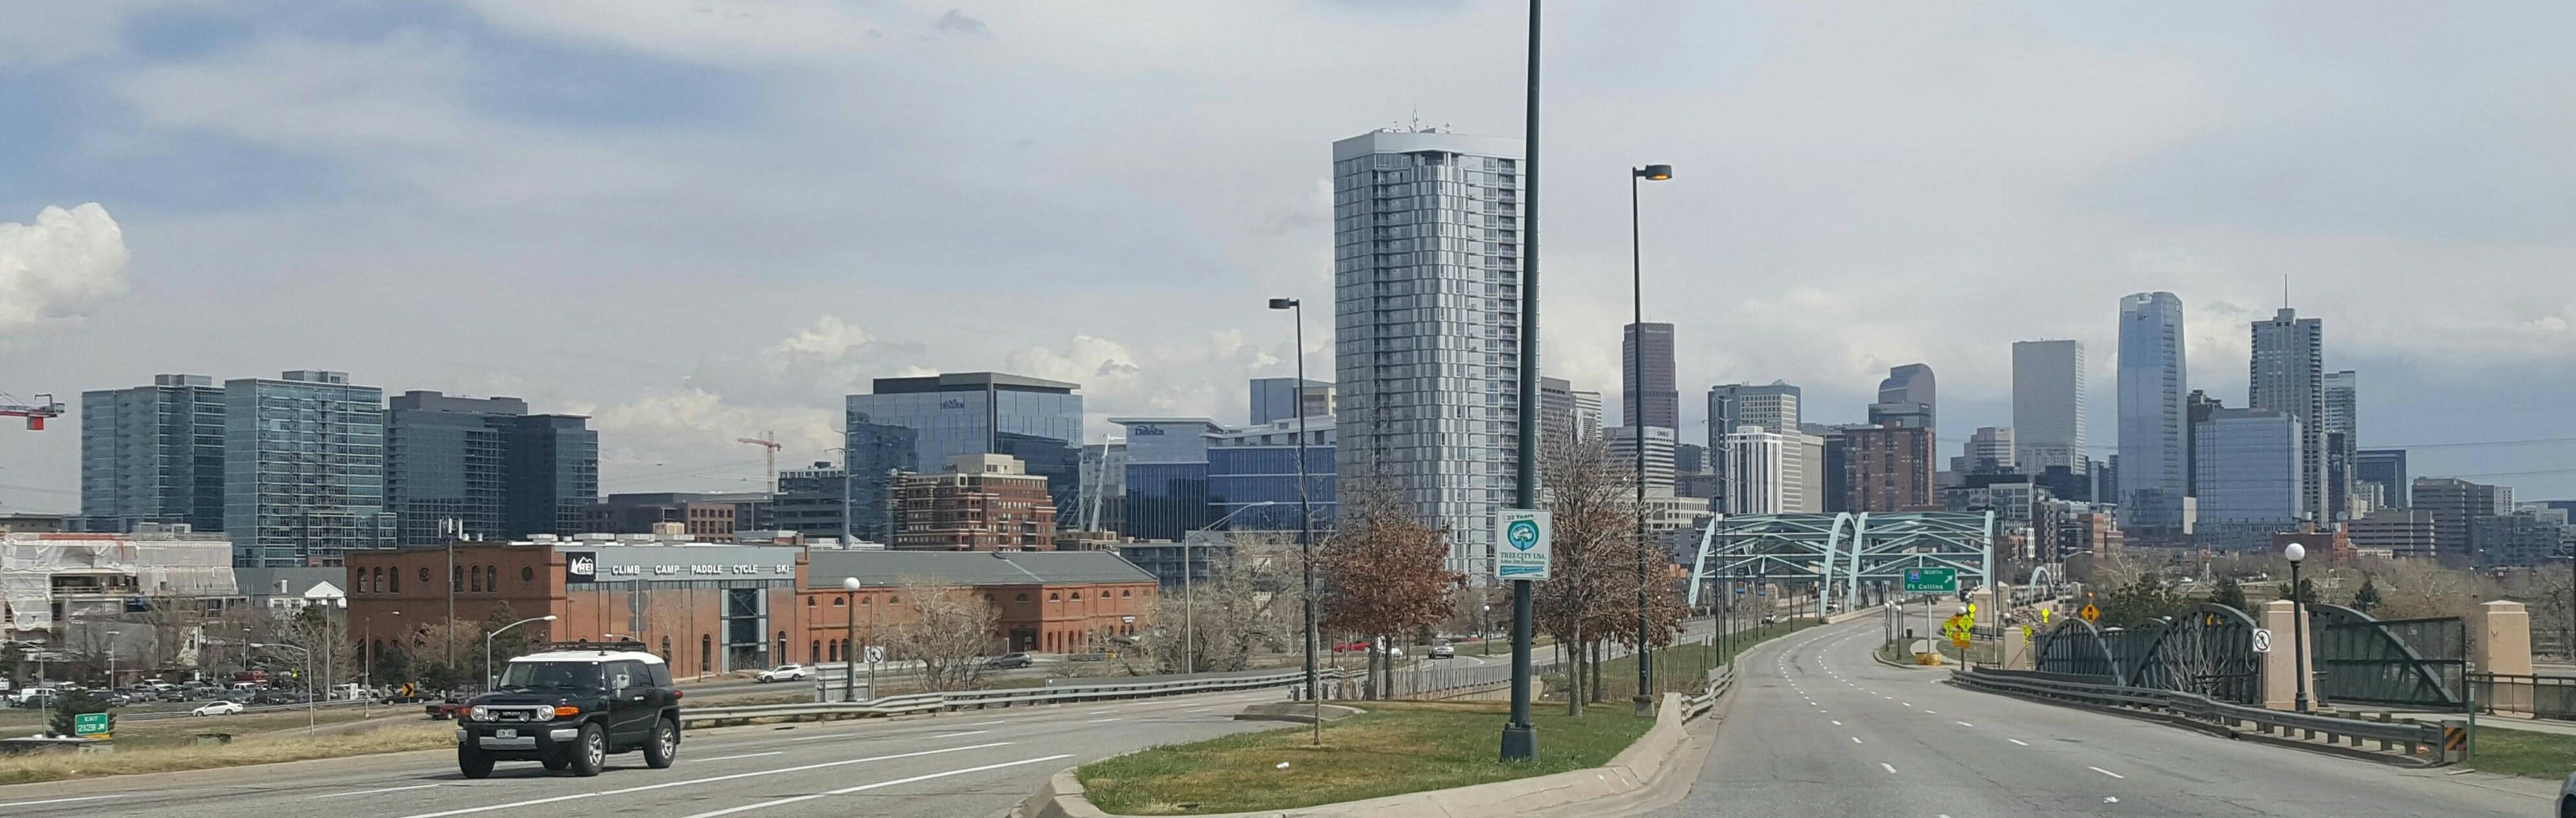 File Denver Skyline From Speer Blvd Near I 25 April 2019